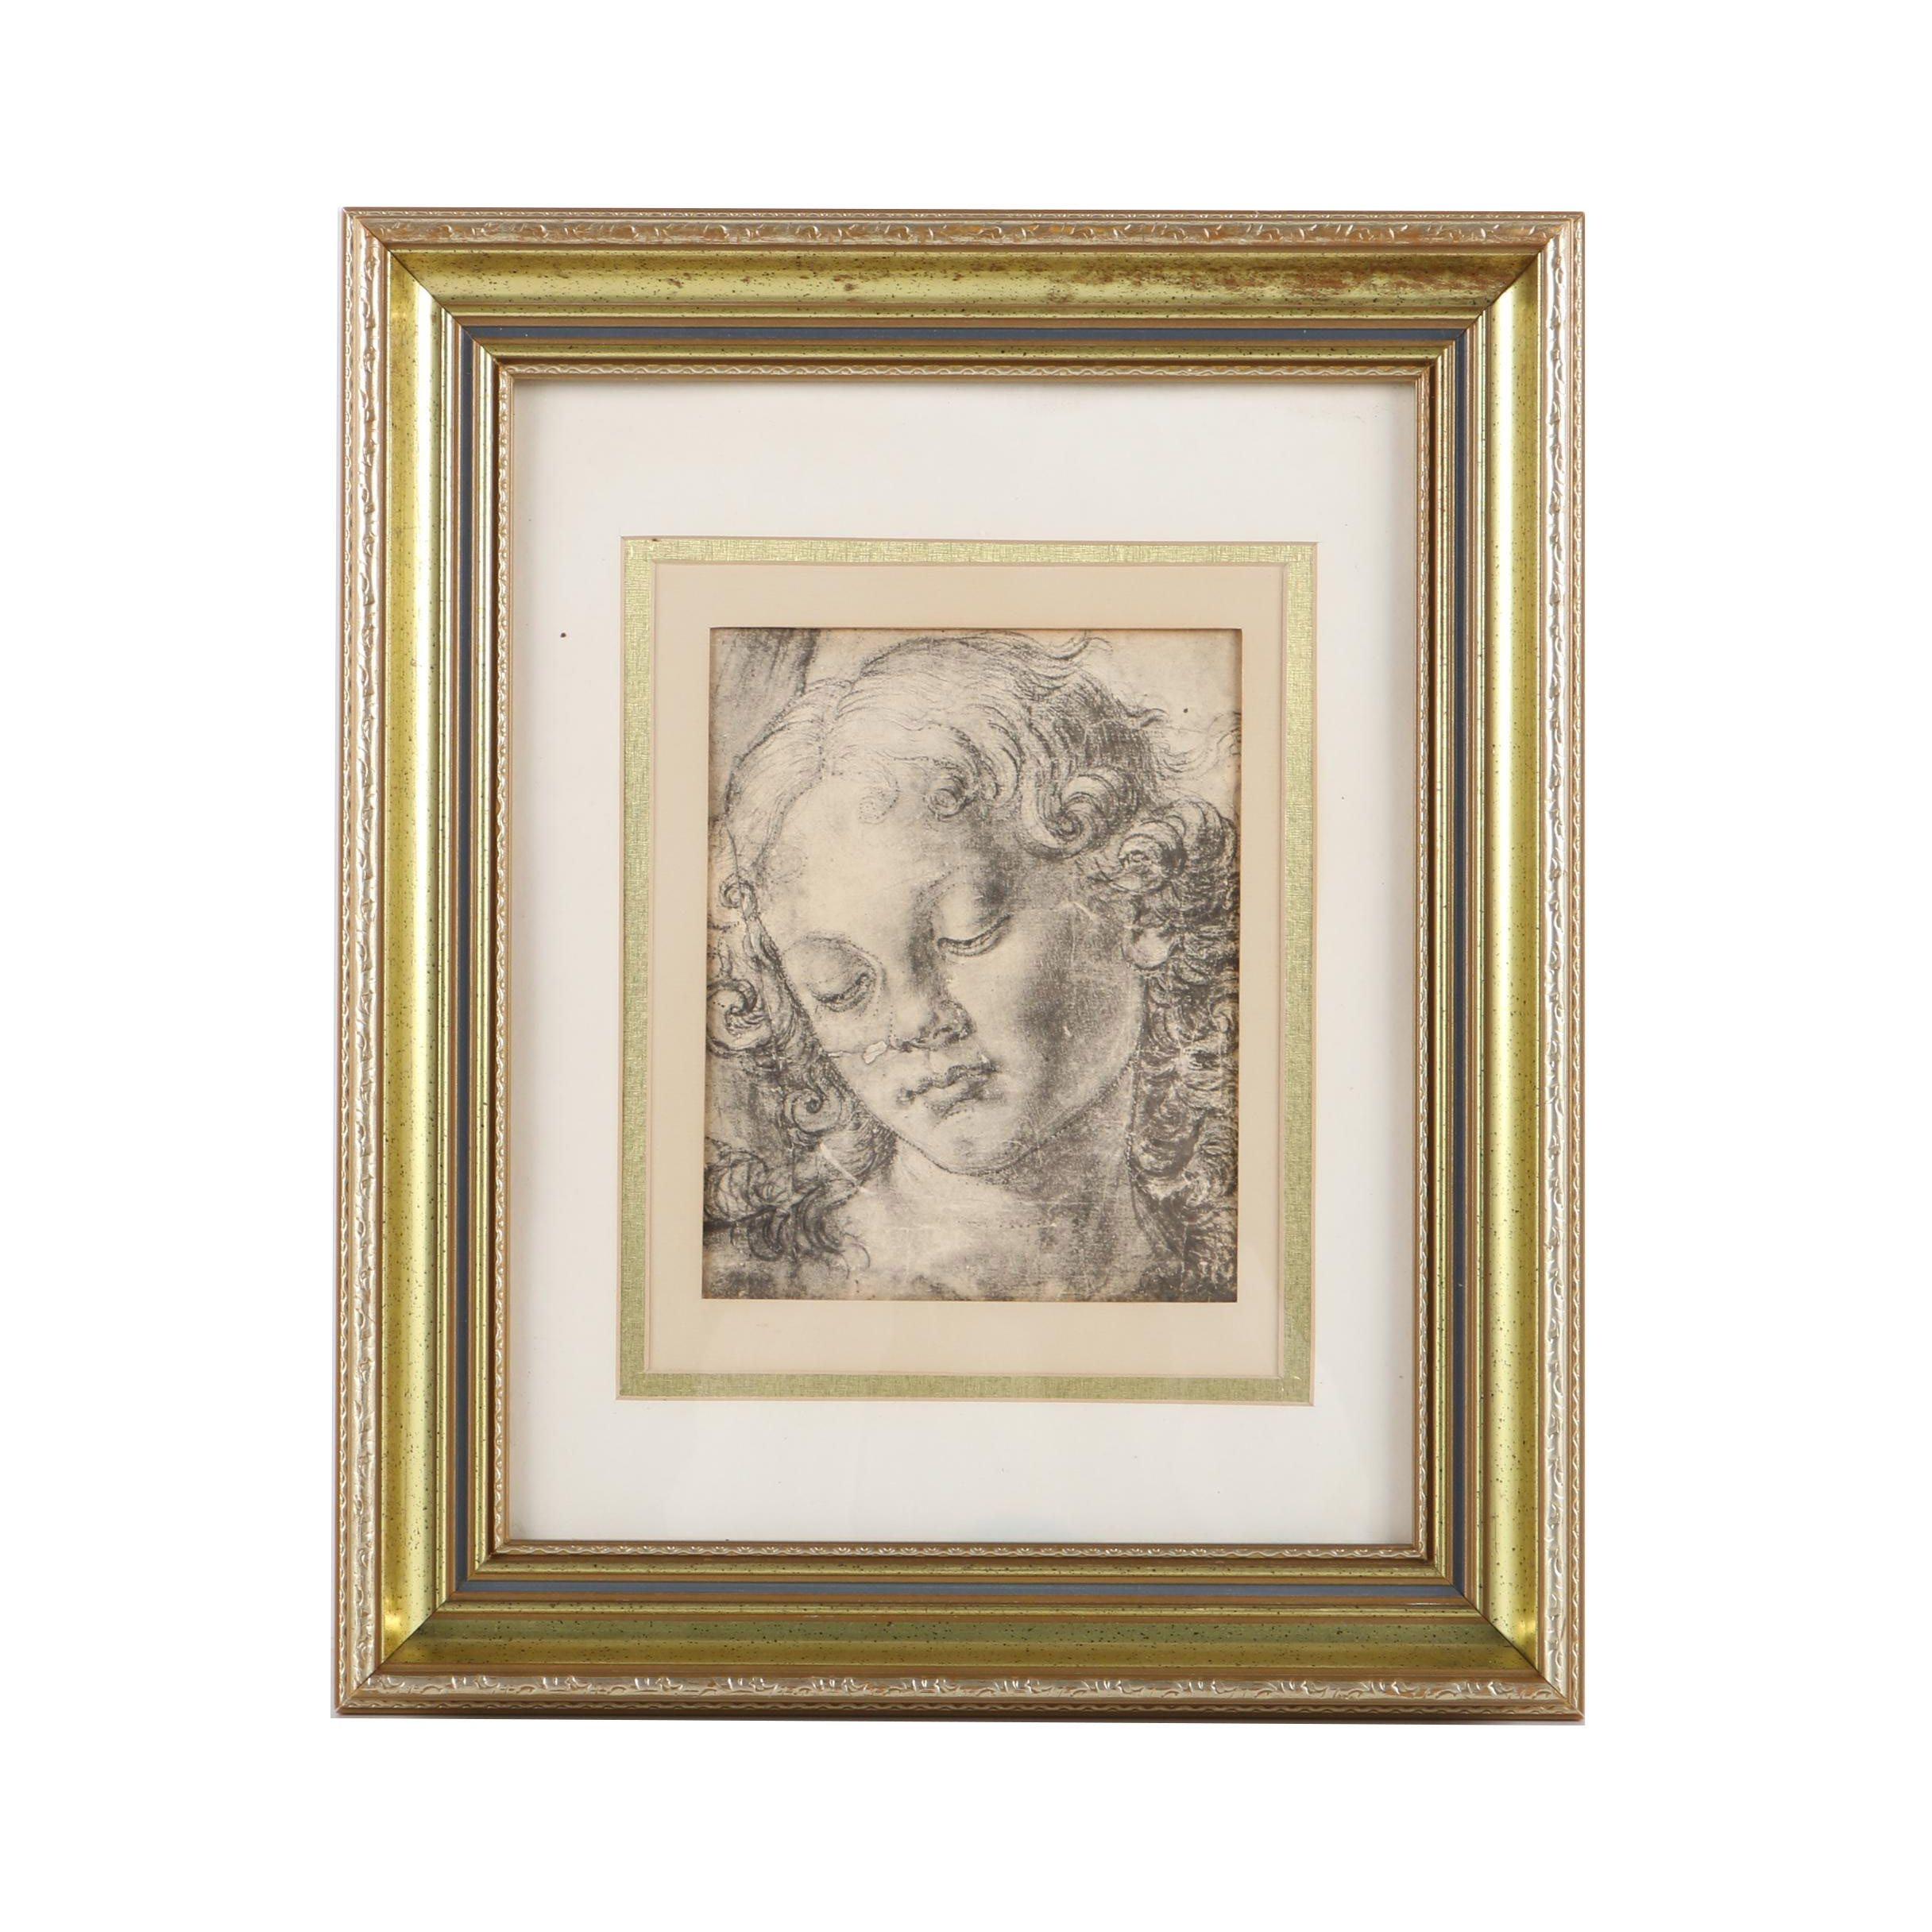 "Halftone Print on Paper After Andrea del Verrocchio ""Head of a Woman"""